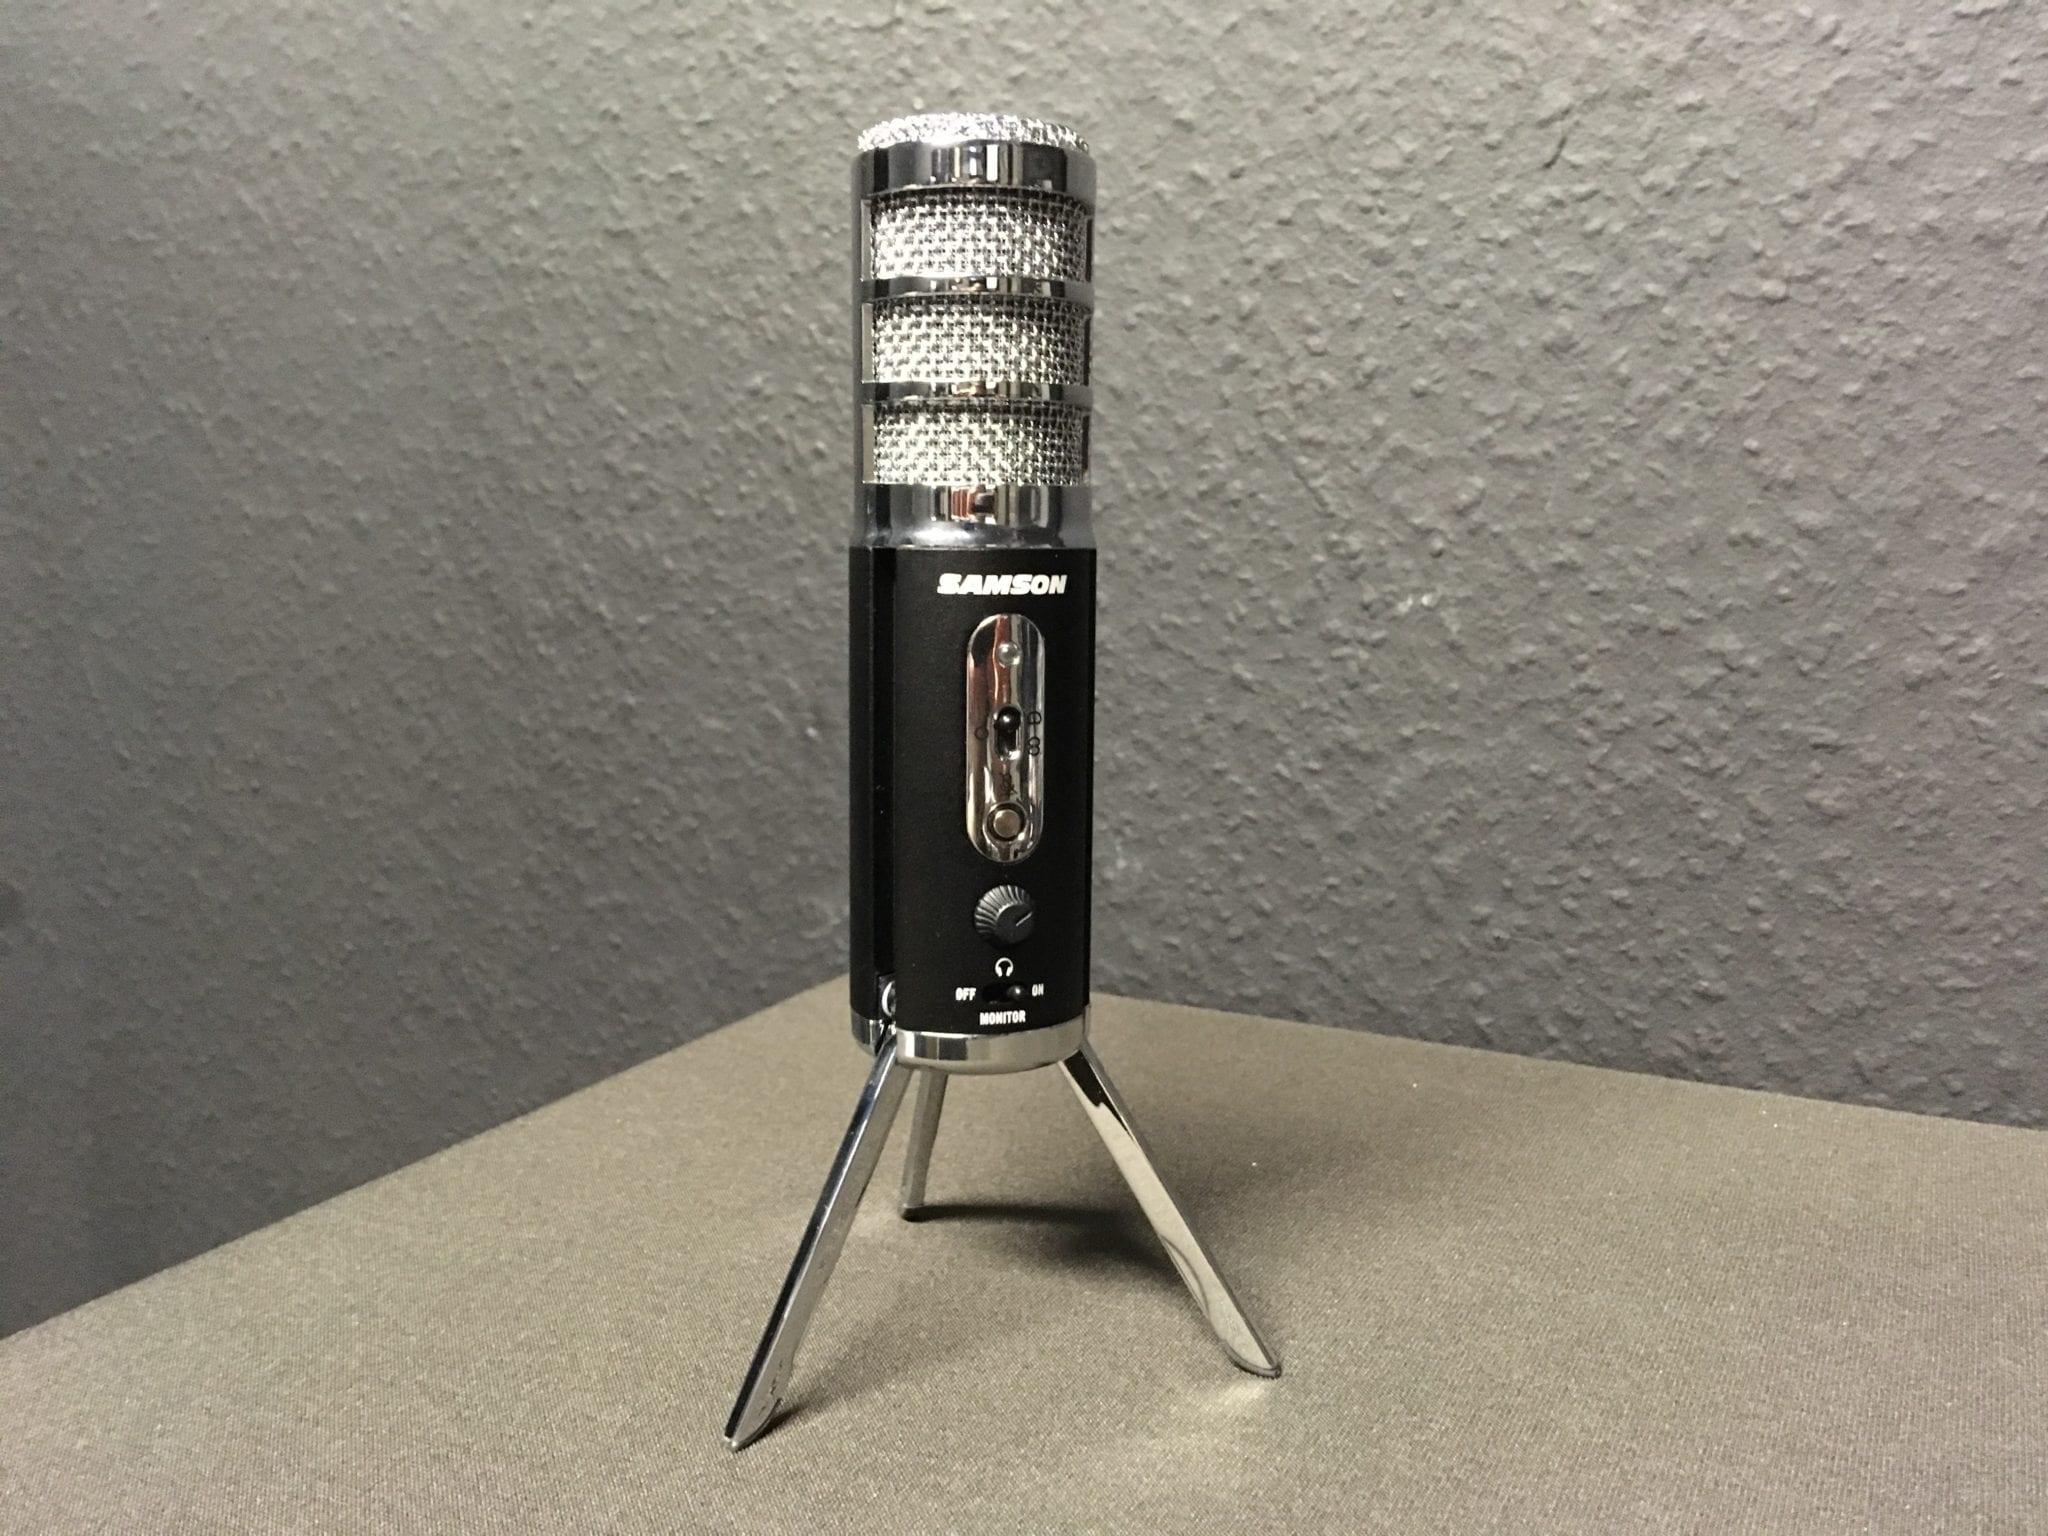 samson satellite usb mic for iphone